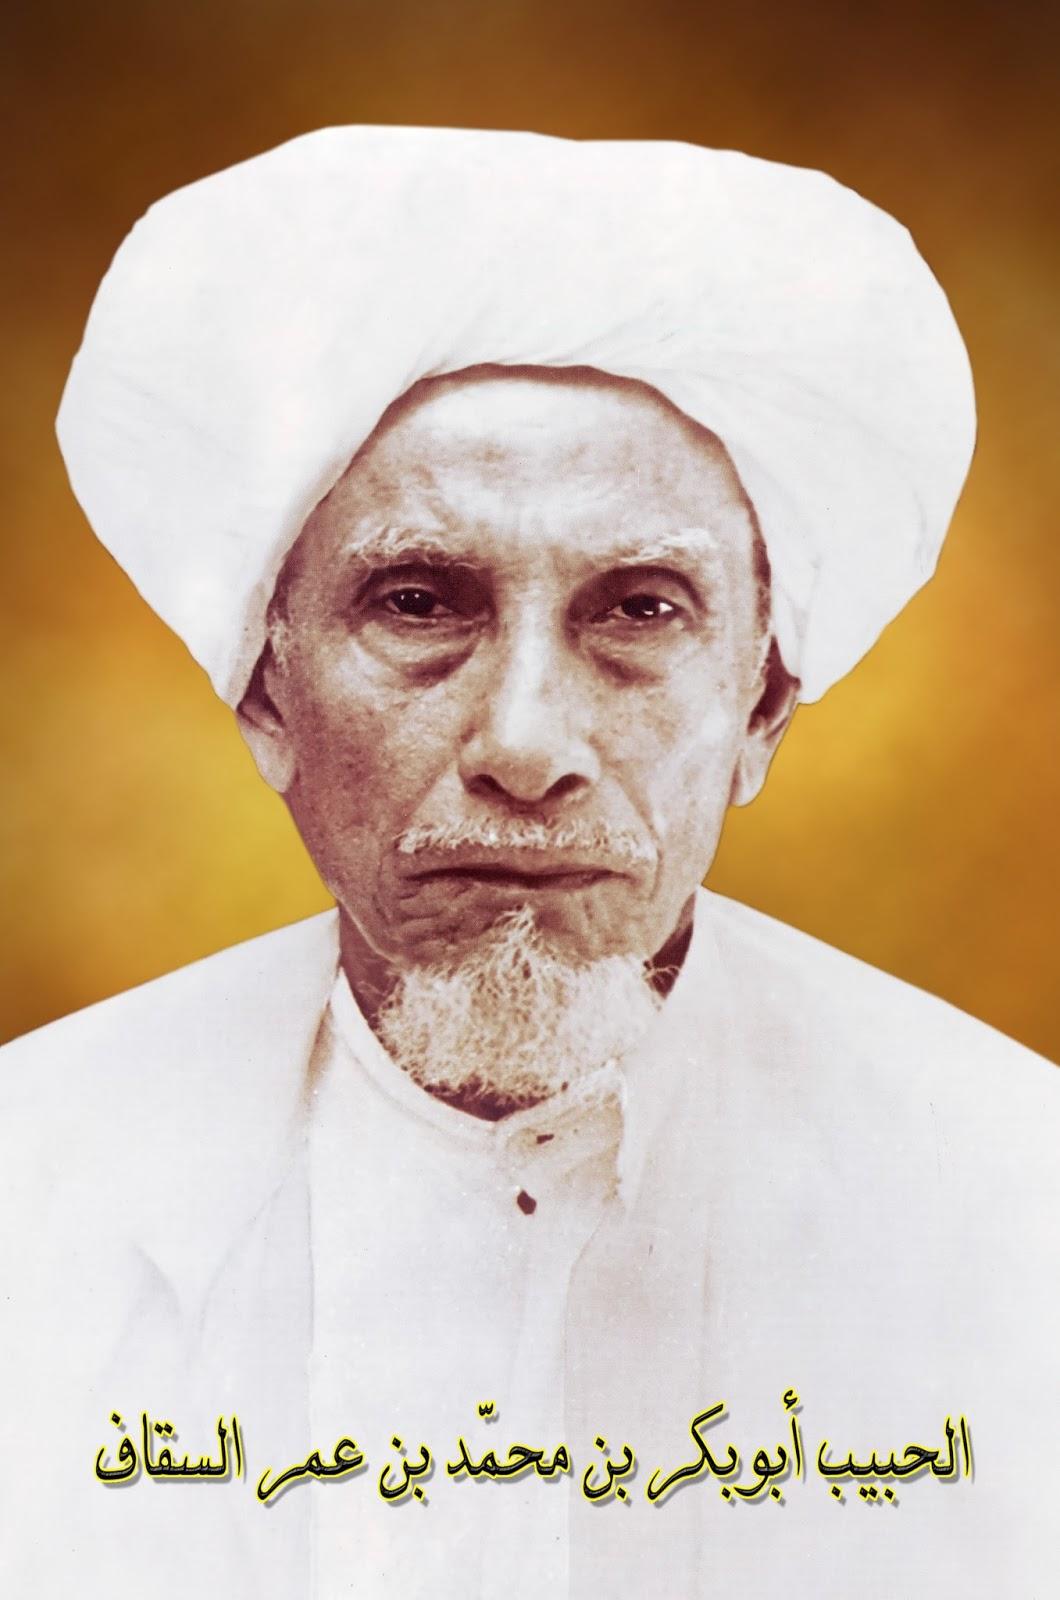 AL HABIB ABU BAKAR BIN MUHAMMAD ASSEGAF (GRESIK) ~ Darul